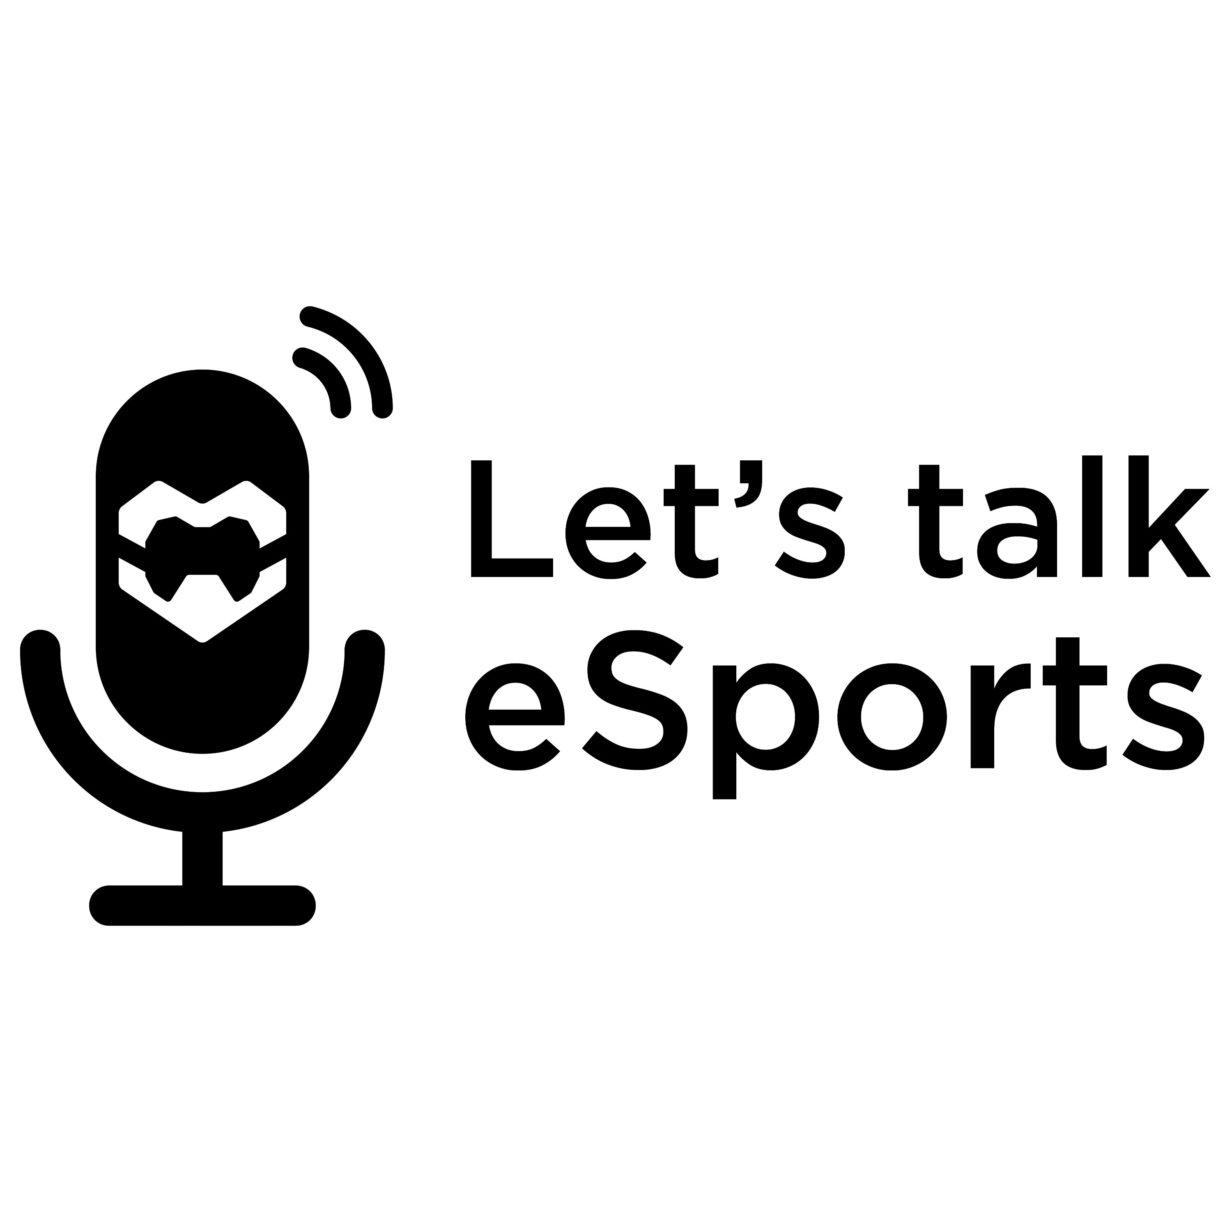 Let's talk eSports Folge 1